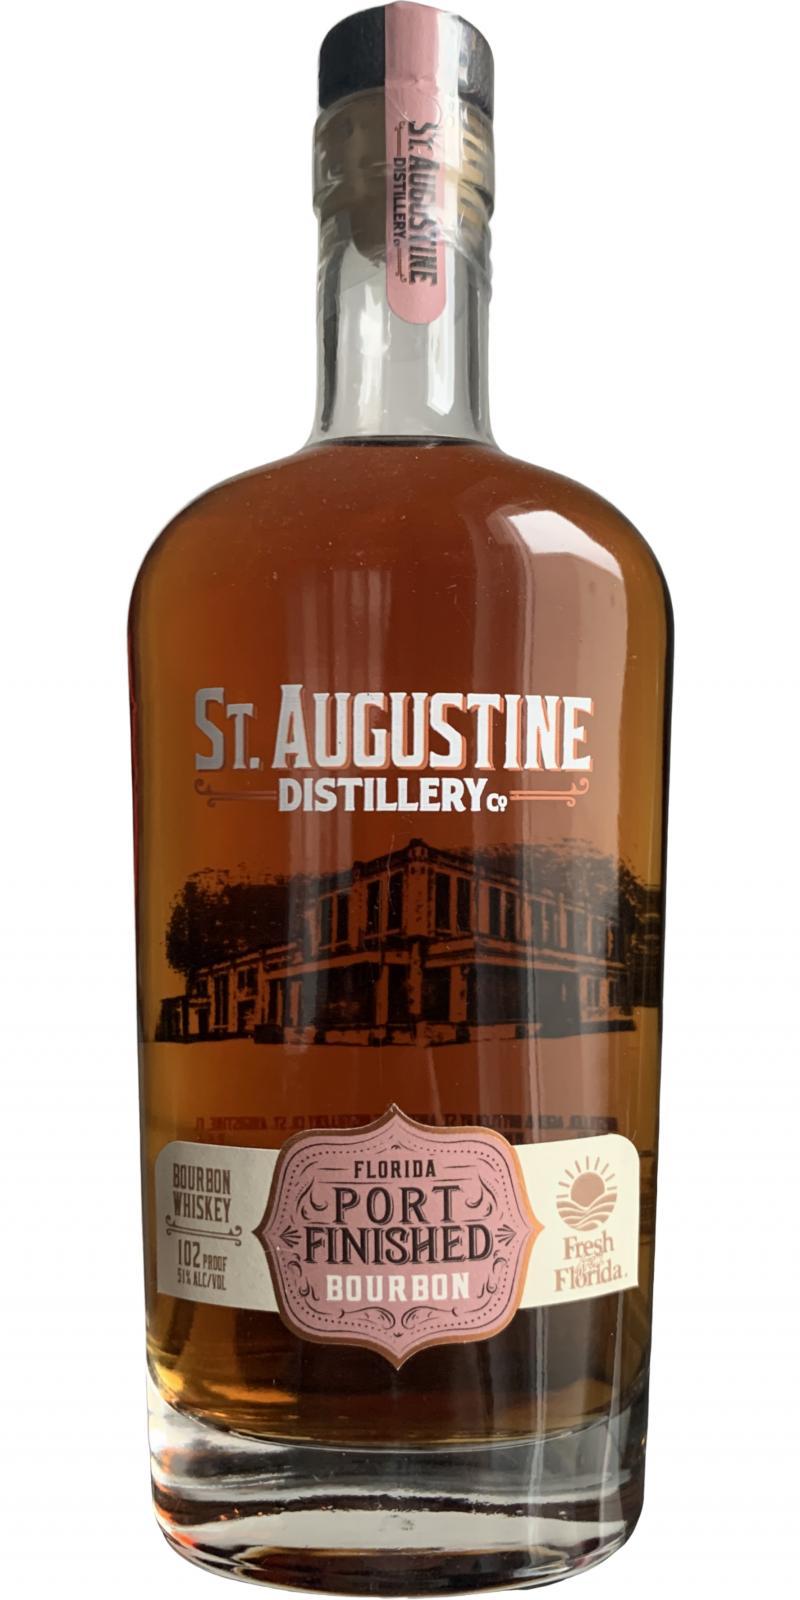 St. Augustine Port Finished Bourbon